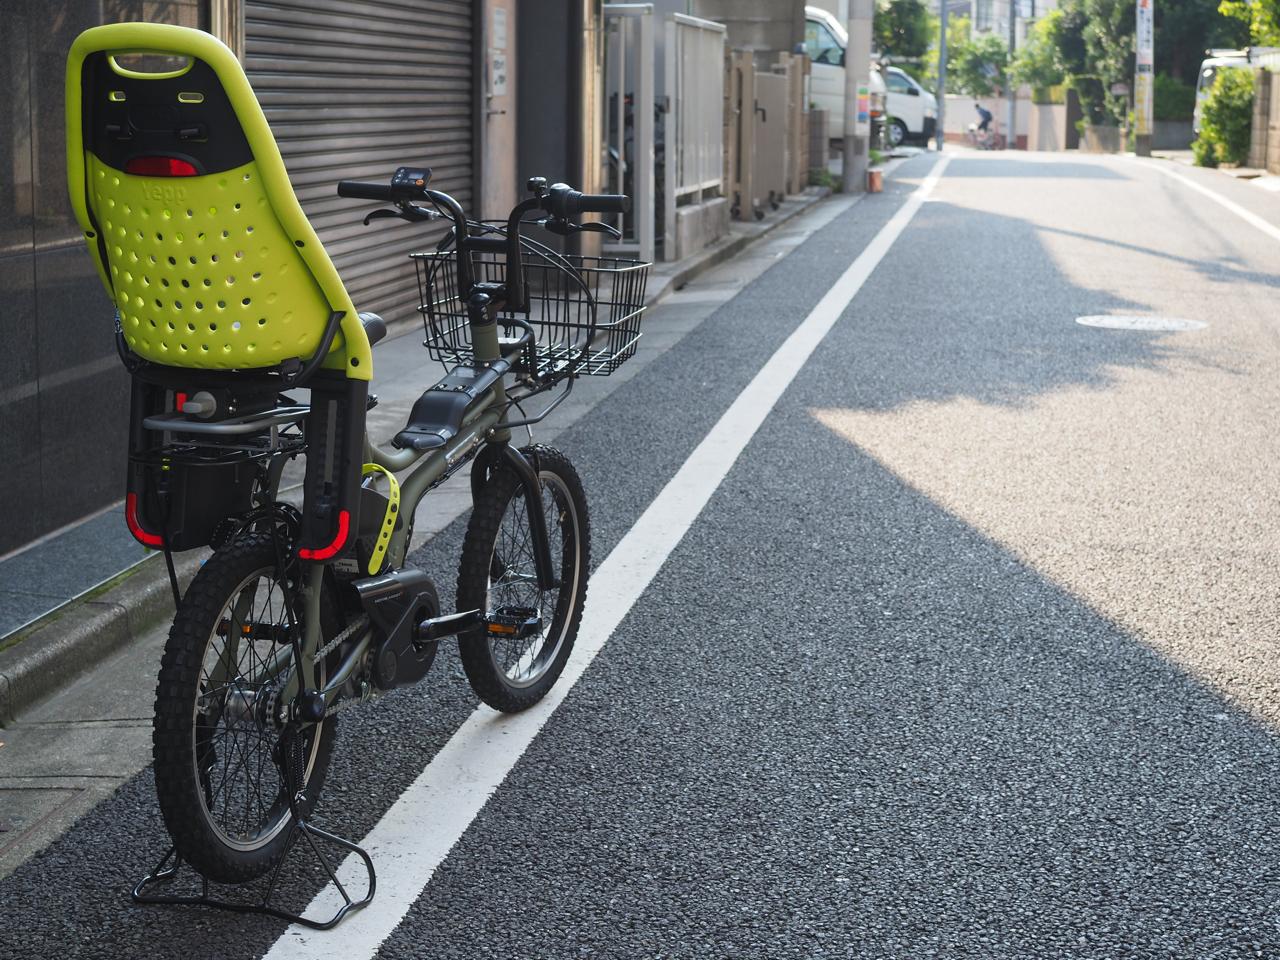 EZ,YEPP,PANASONIC,イーゼット,イェップ,電動自転車,子乗せ自転車